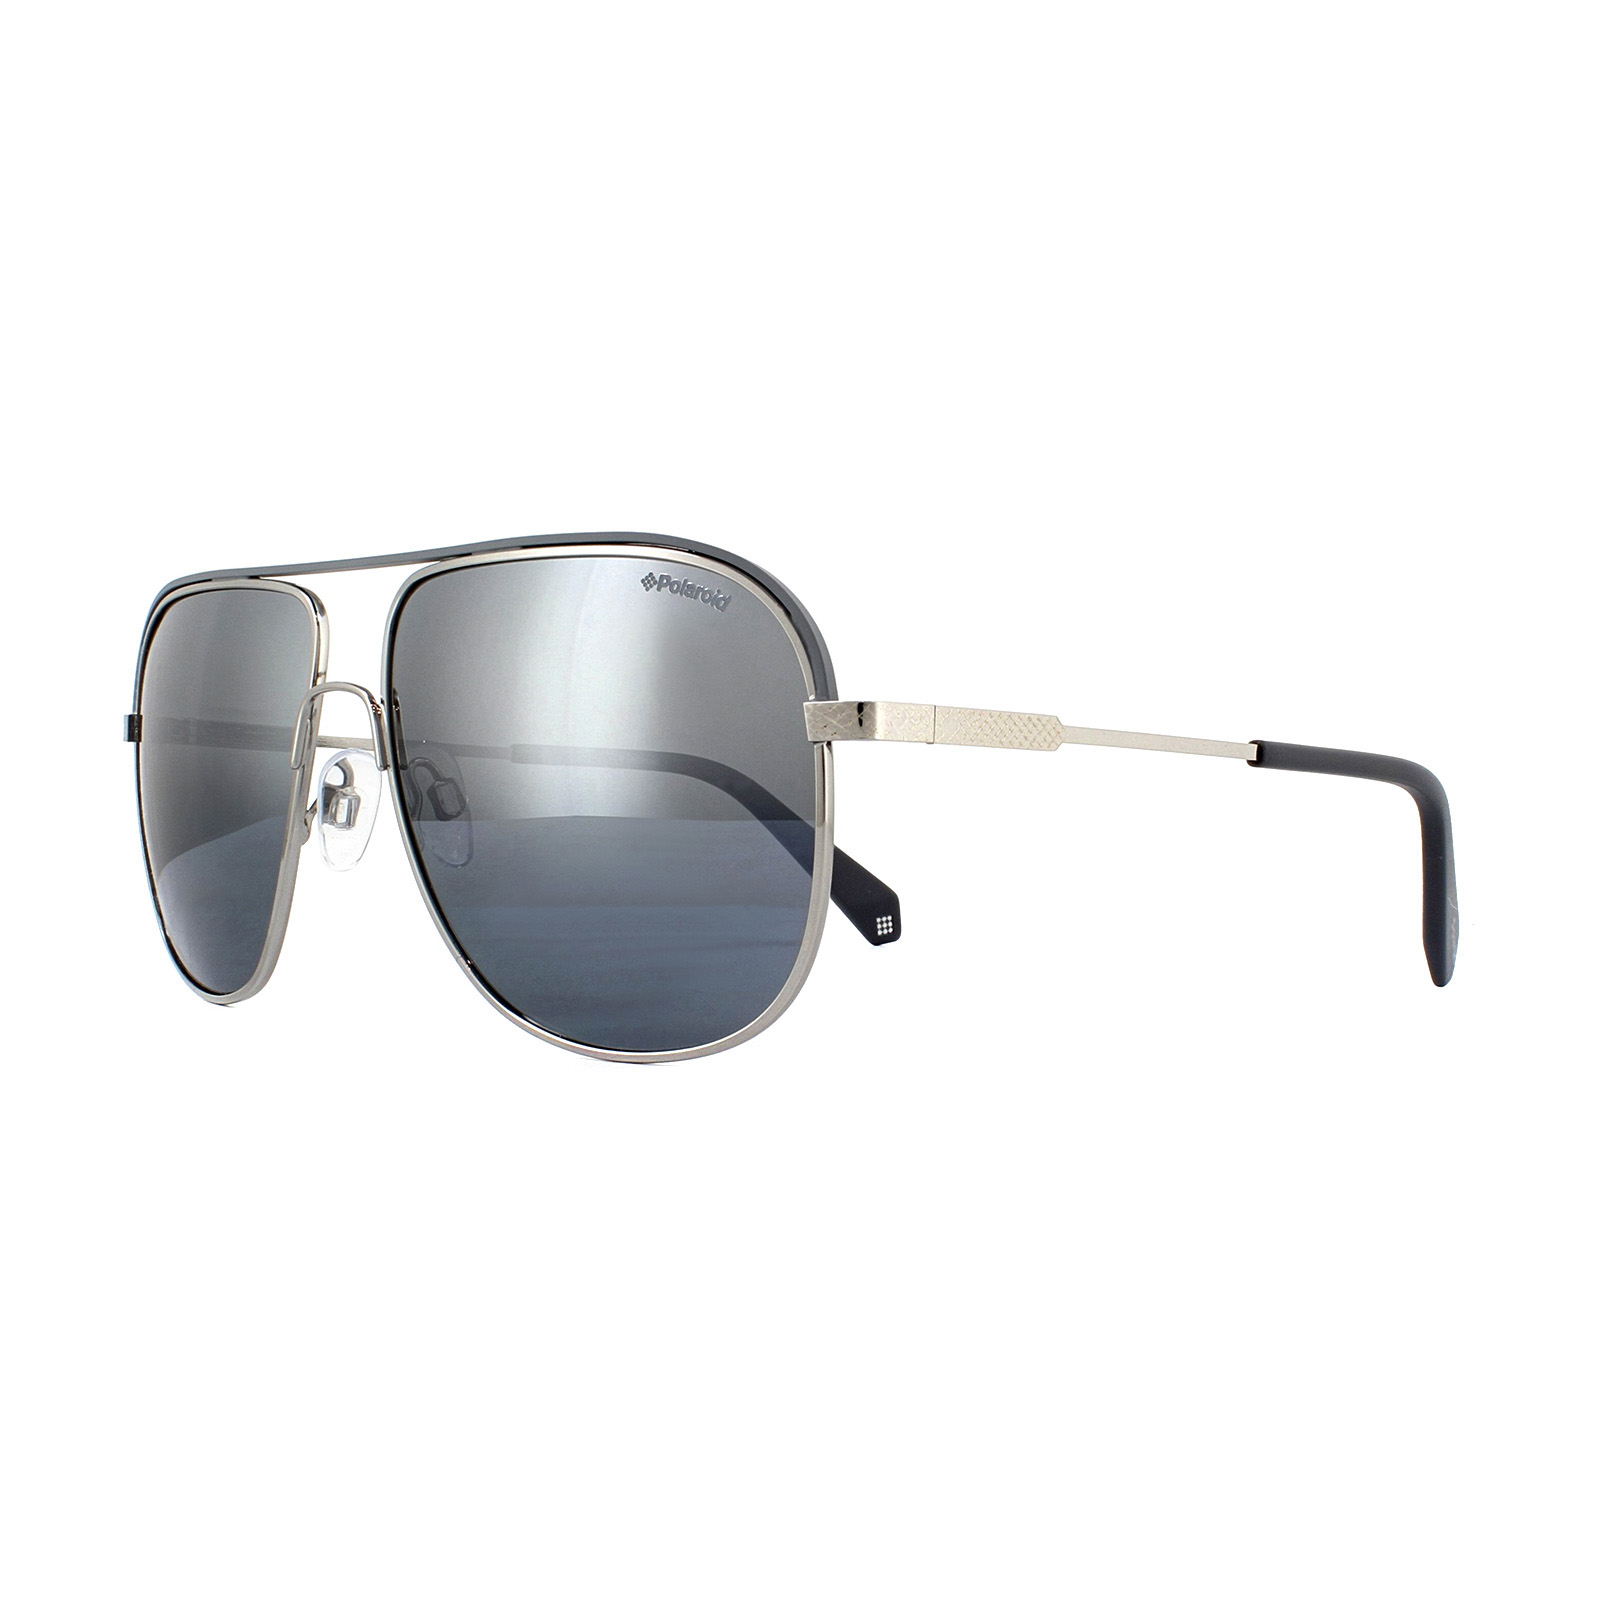 Sentinel Polaroid Sunglasses PLD 2055 S 6LB 1A Ruthenium Grey Gradient  Polarized b0d7285b244f